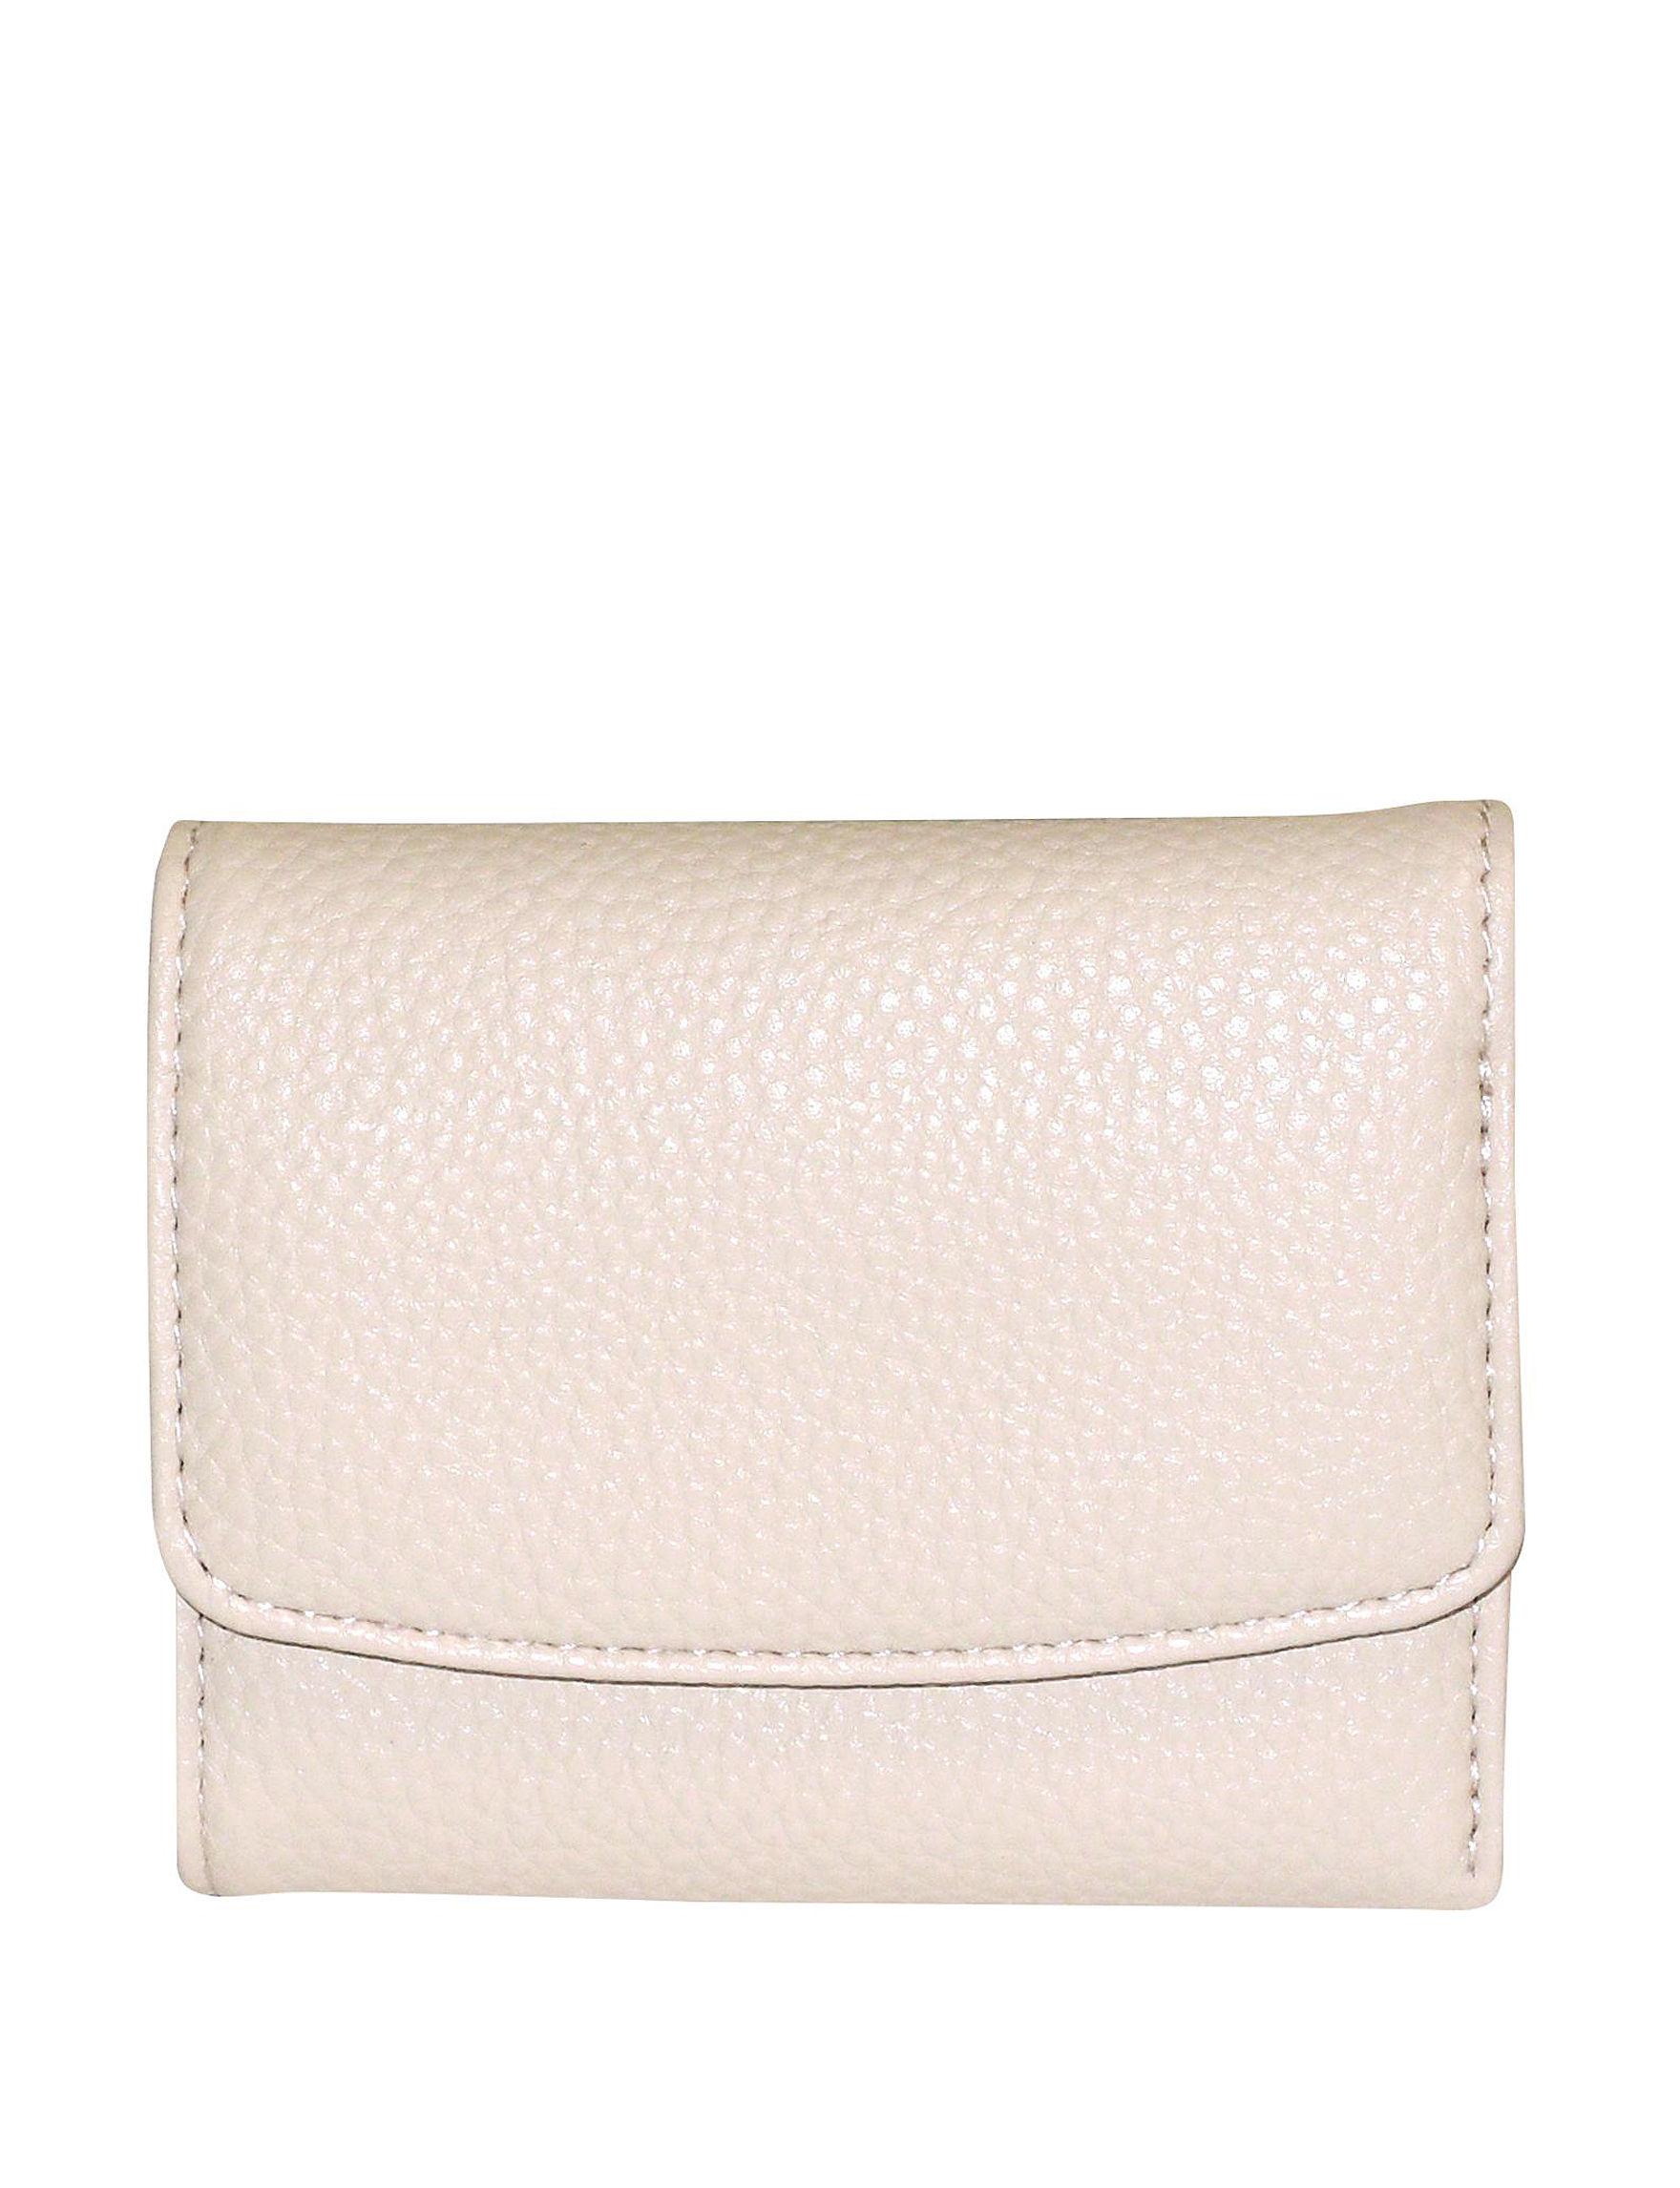 Buxton Beige Wallet